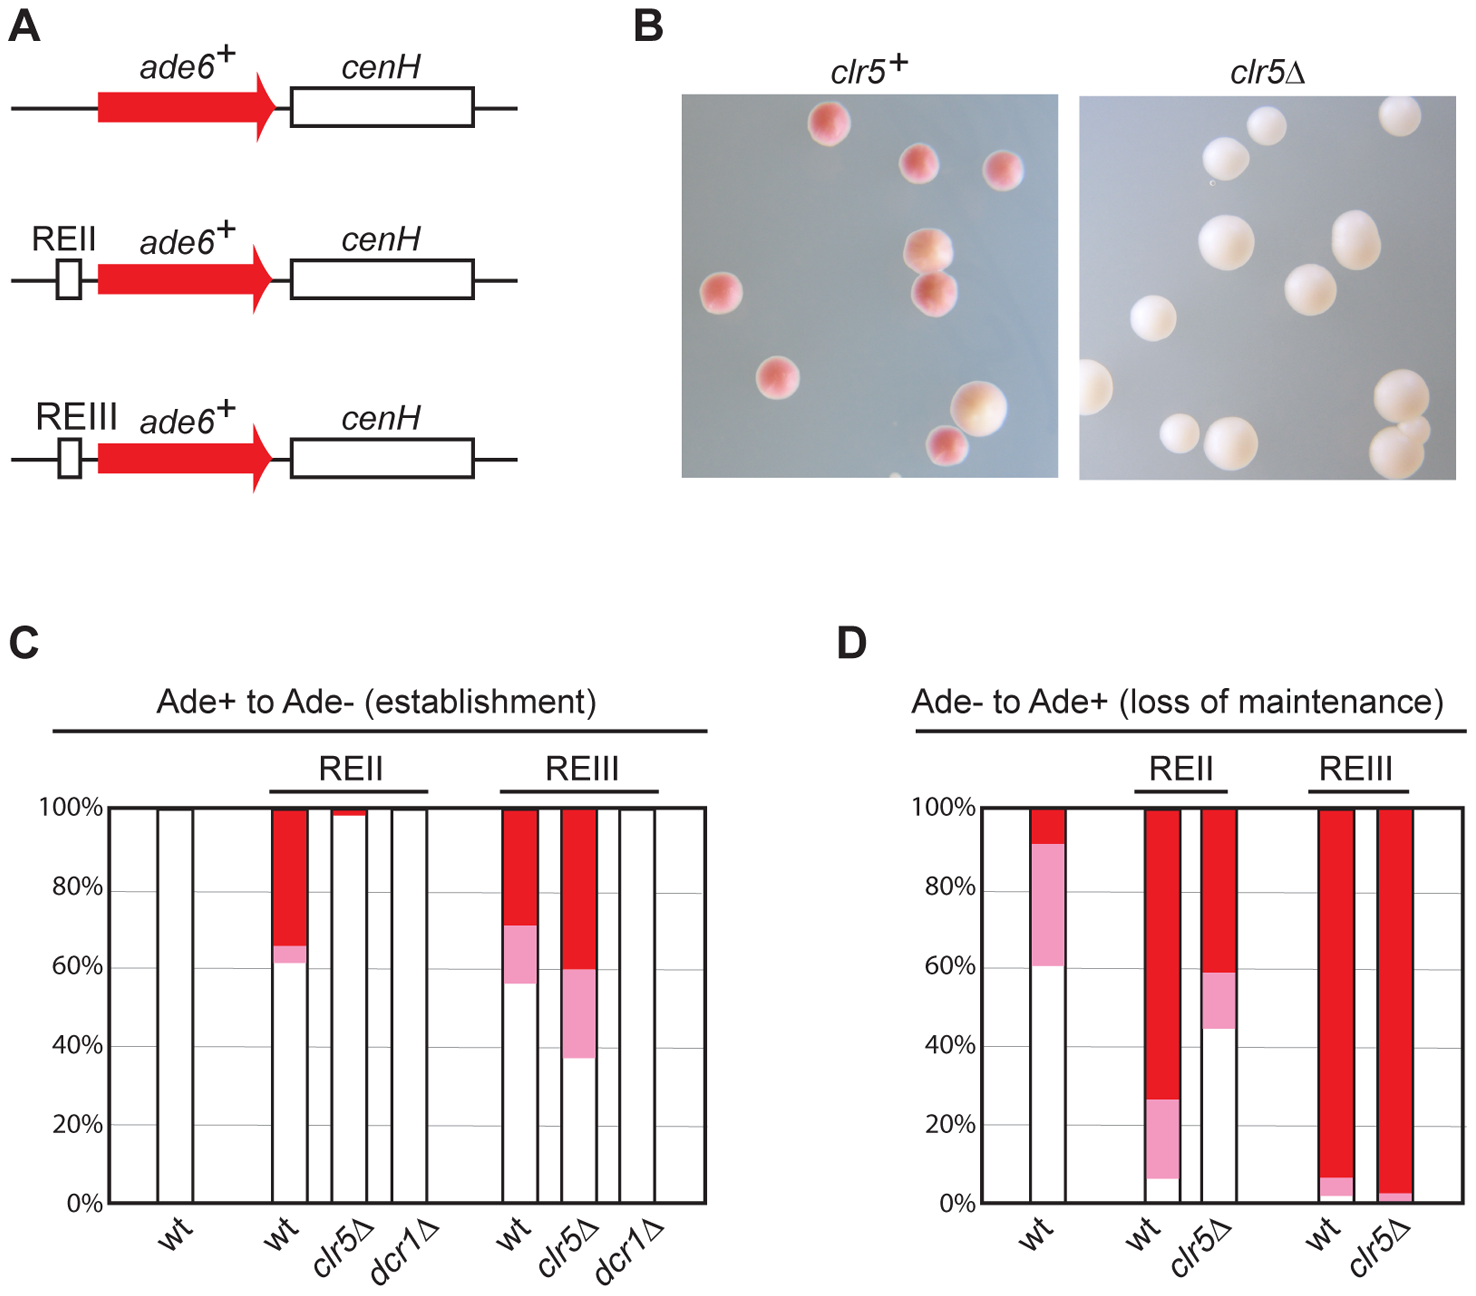 Clr5 mediates gene silencing at an ectopic site in an REII-dependent manner.